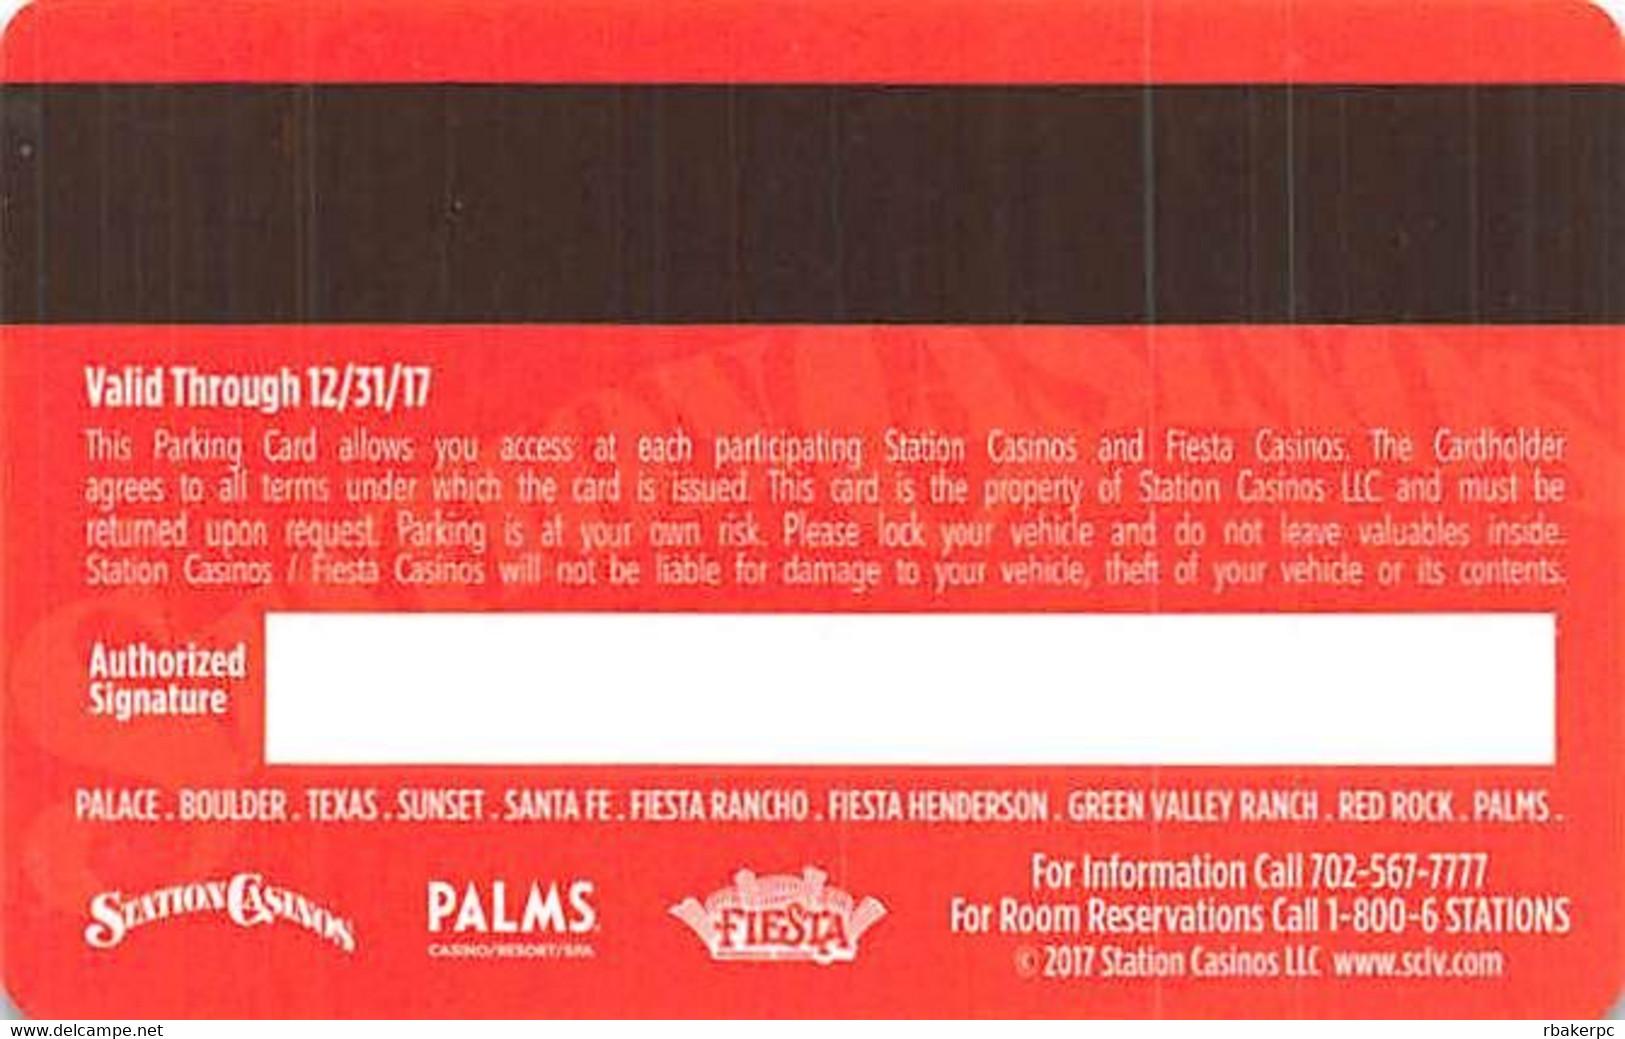 Station Casinos Las Vegas, NV - VIP Parking Card - Copyright 2017 - Exp  12/31/17 - Casino Cards